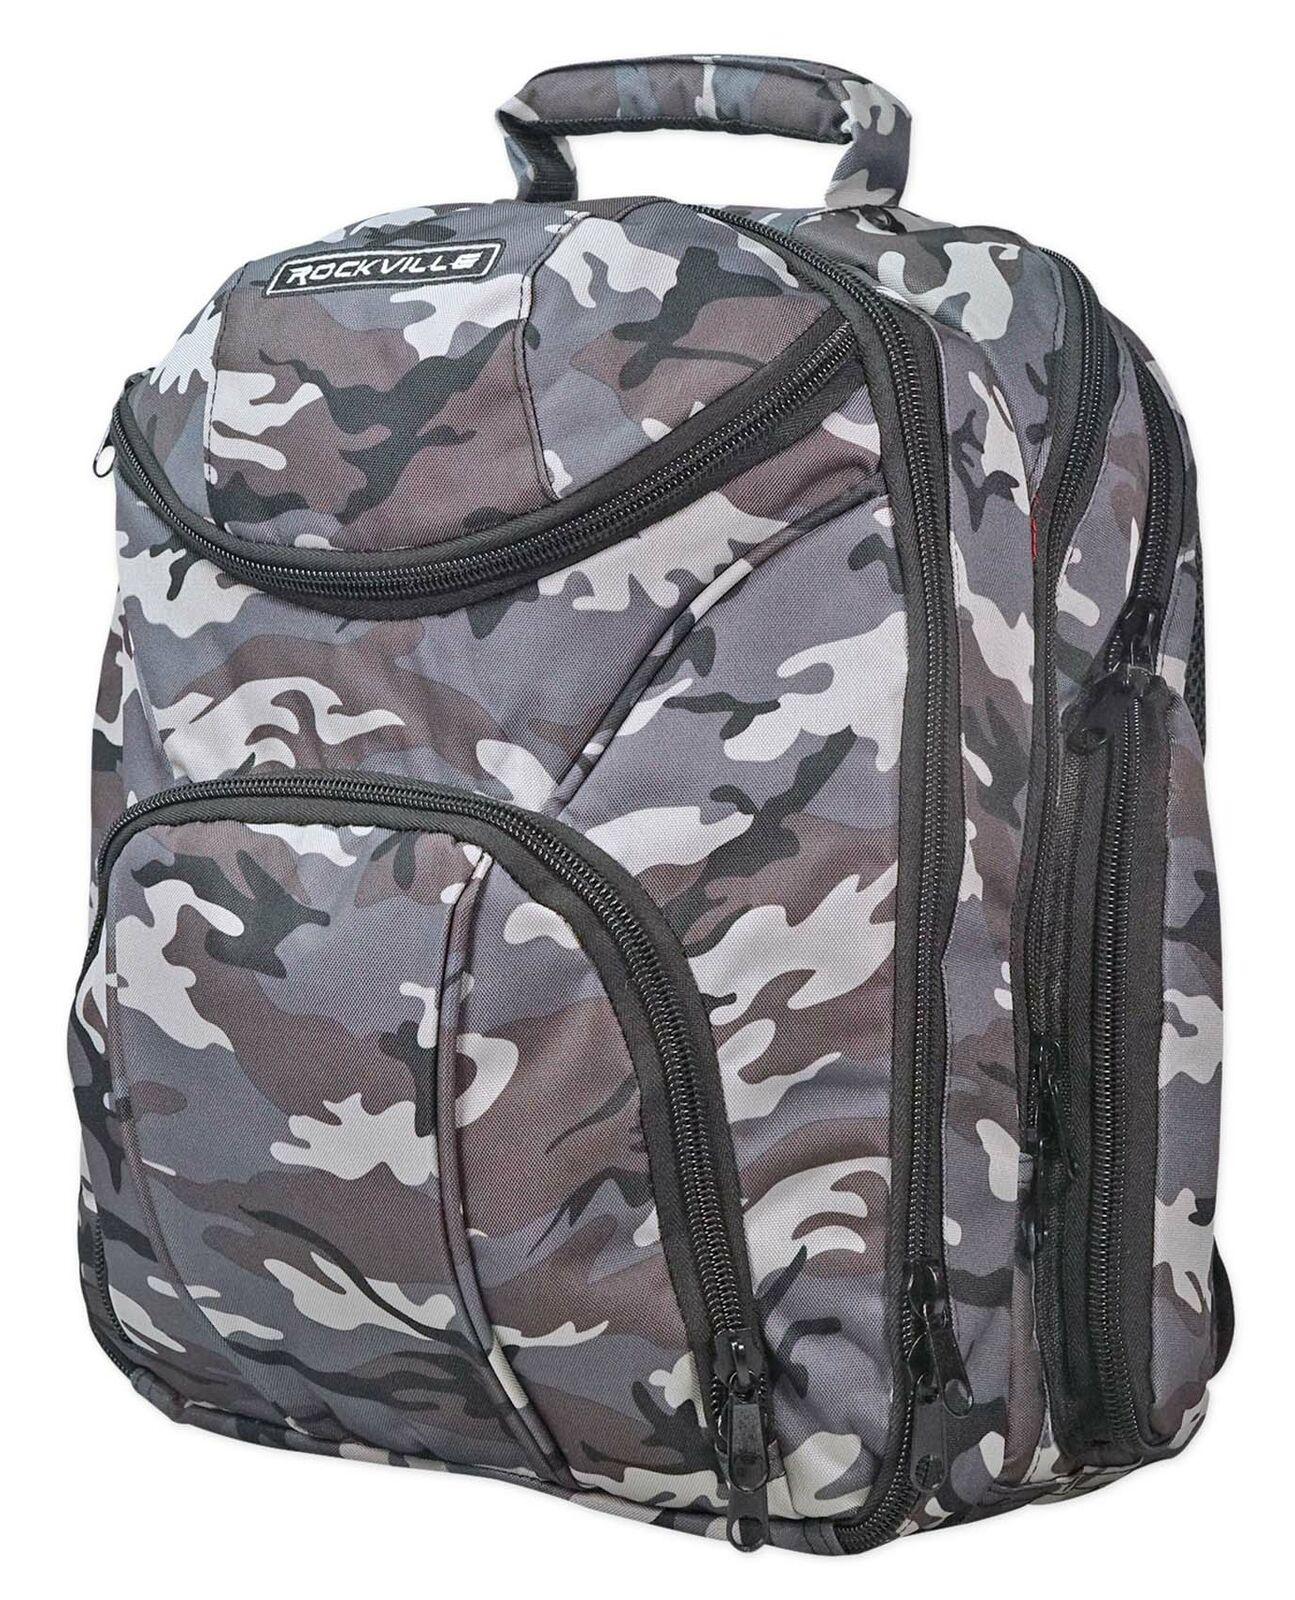 Rockville Travel Case Camo Backpack Bag For Mackie 402VLZ4 Mixer